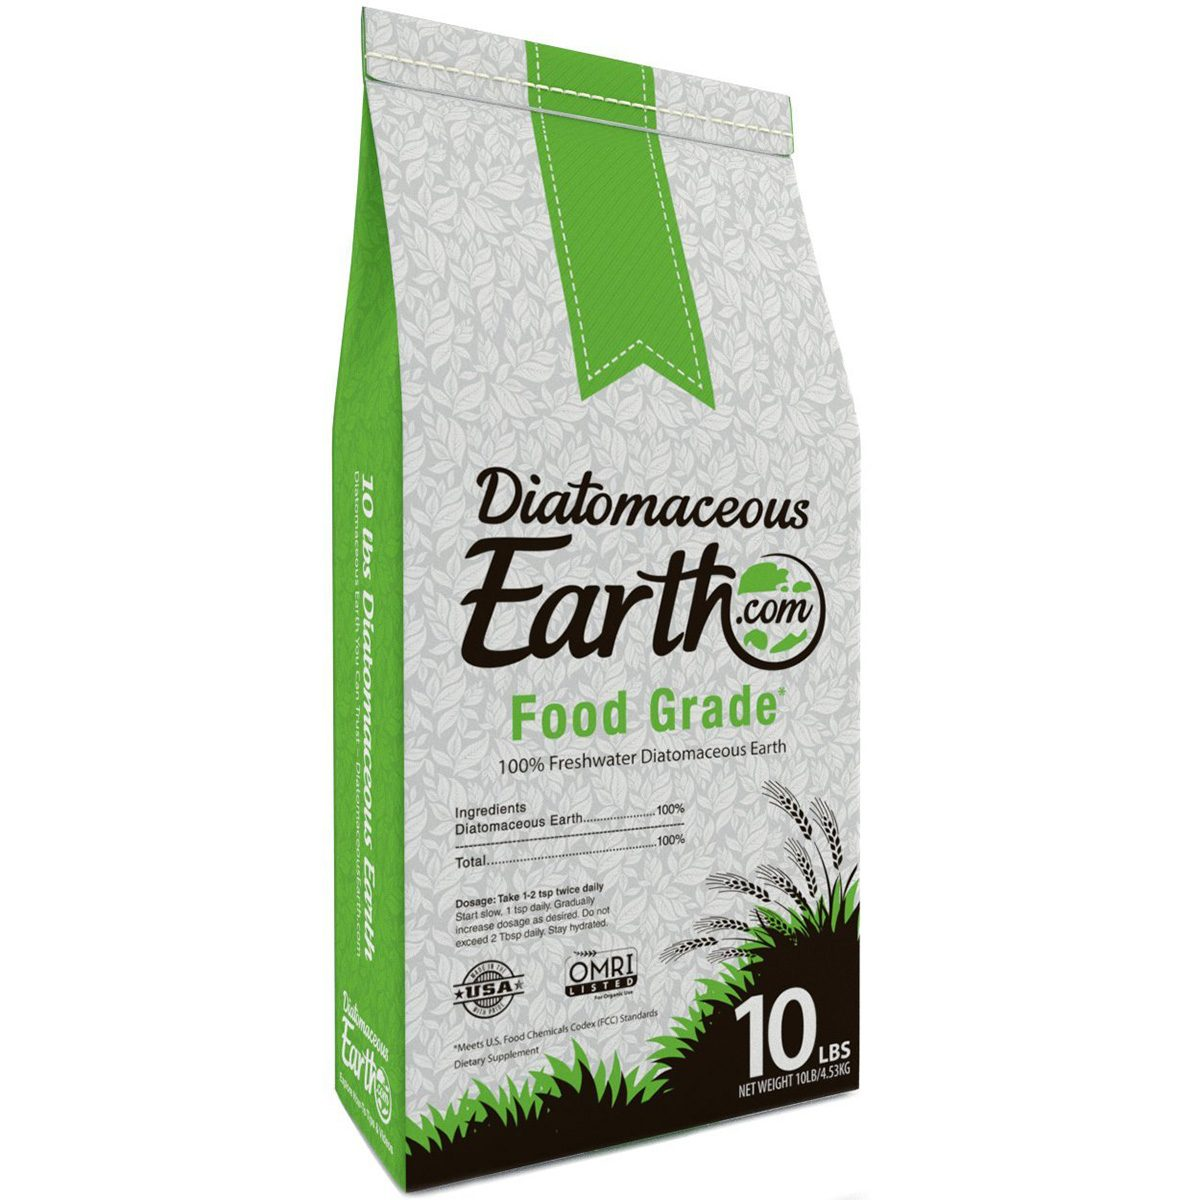 Organic Freshwater Food Grade Diatomaceous Earth